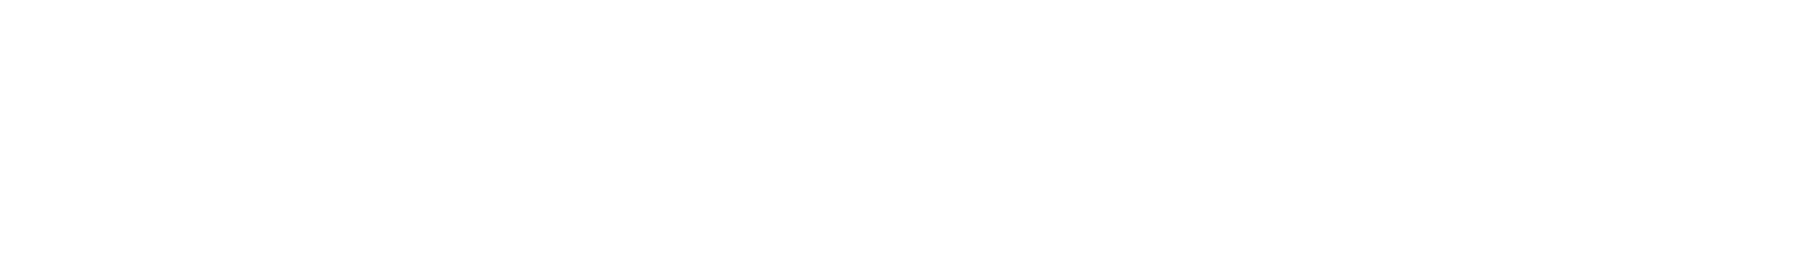 80 f piano mountainair 01